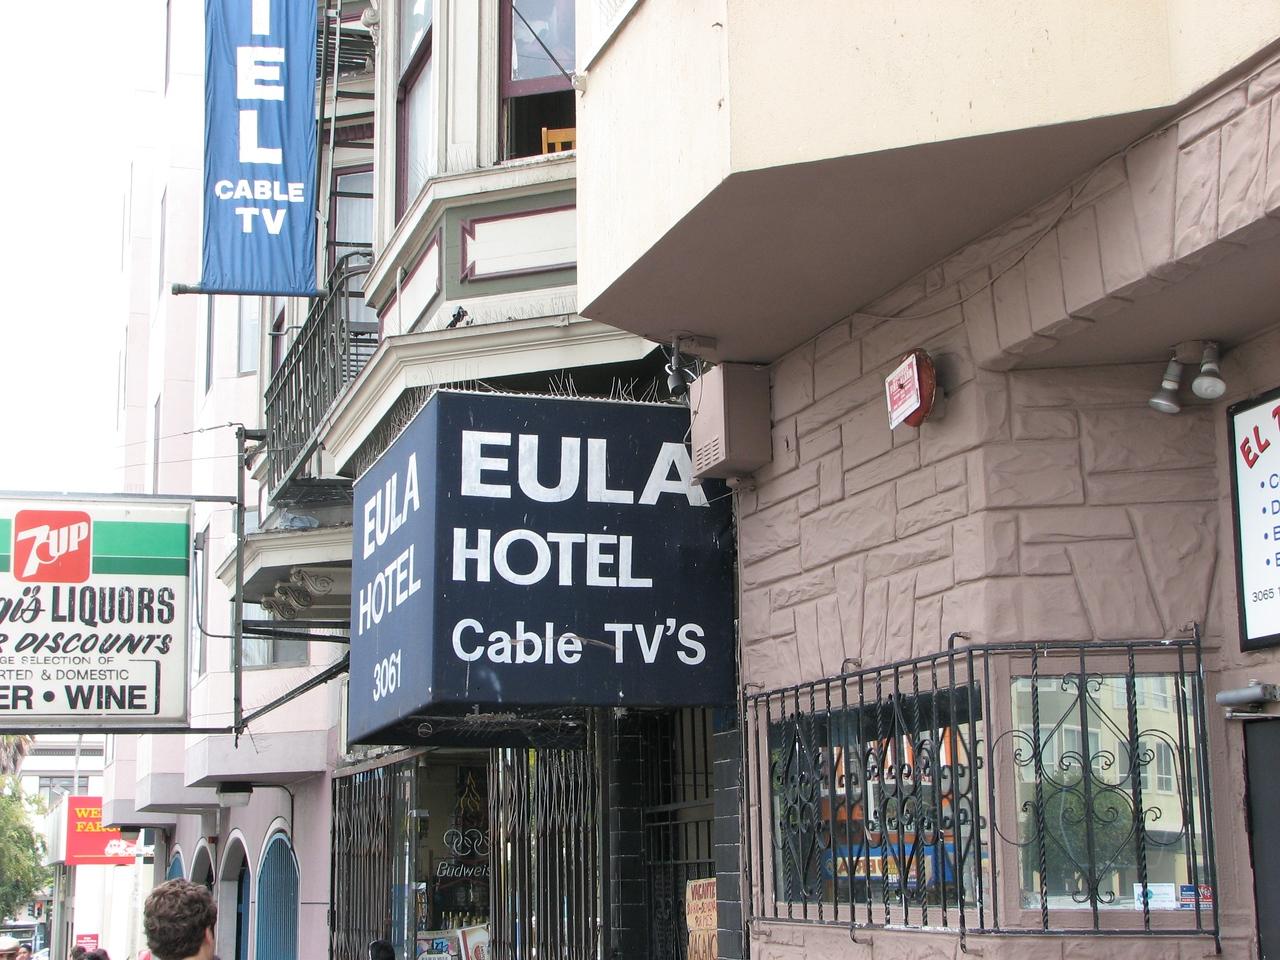 The EULA hotel WWDC 2009